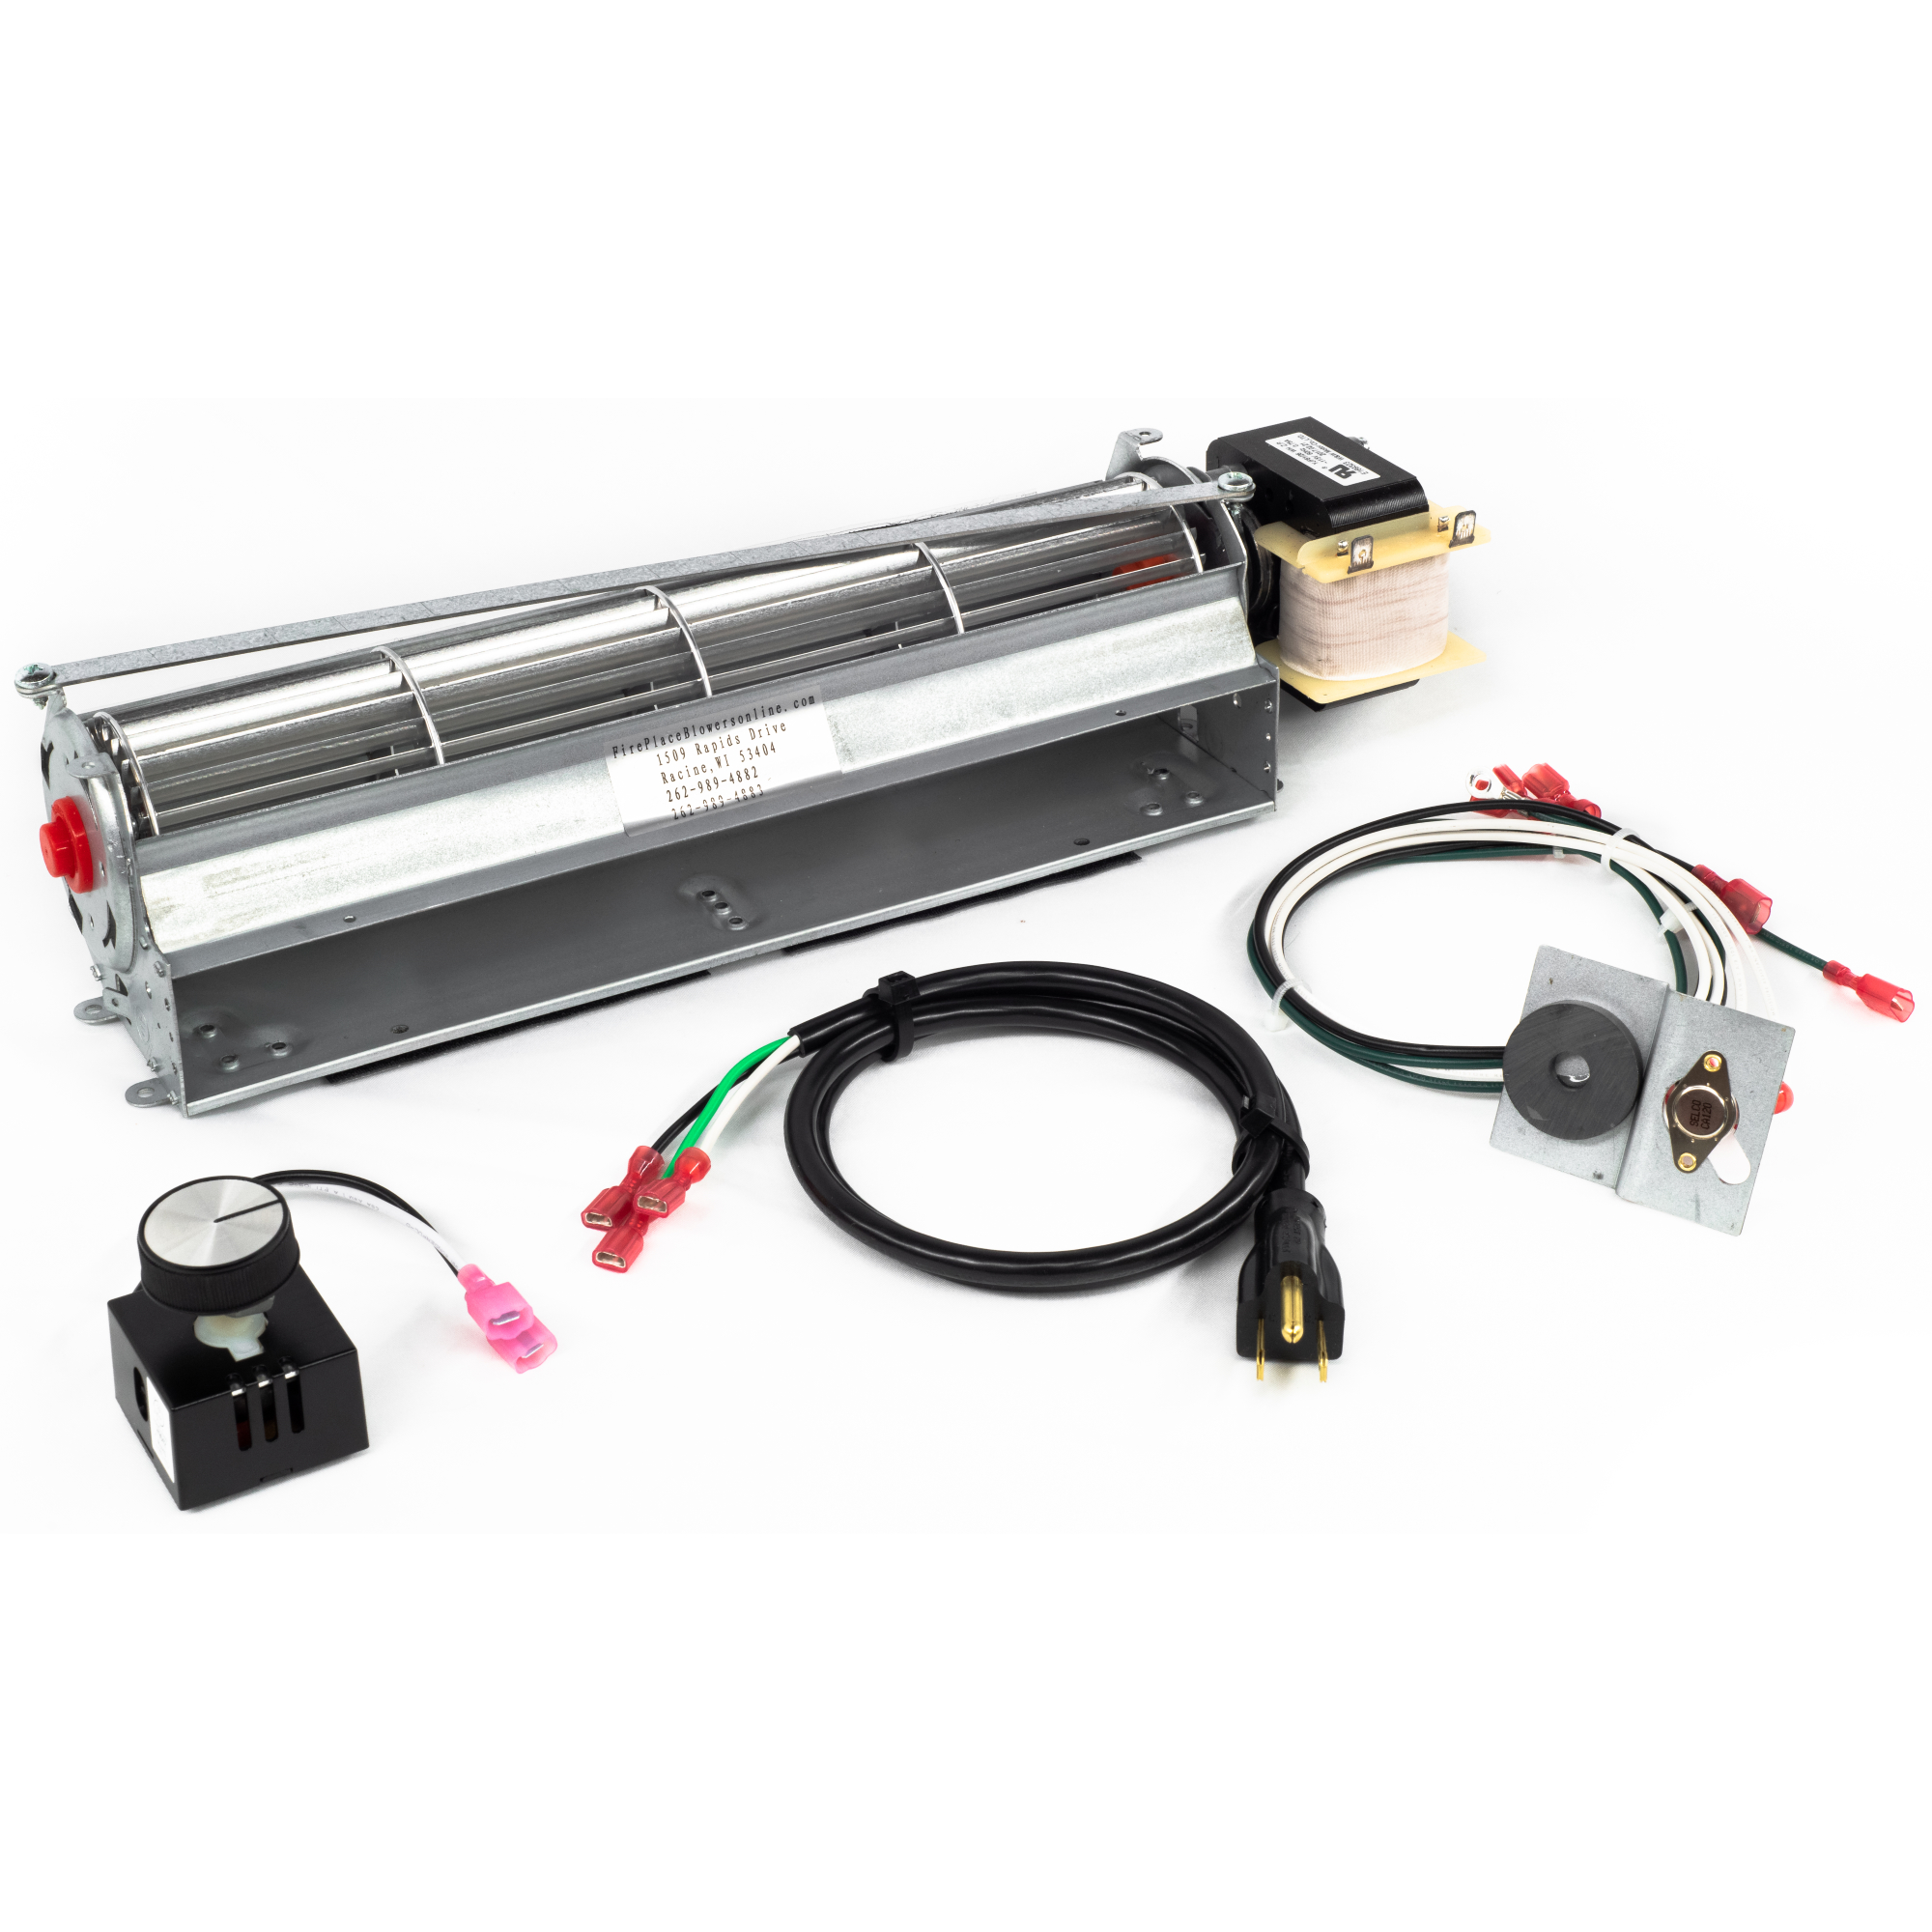 GA3700T(A) Fireplace Blower Kit for Desa, FMI & Vanguard Fireplaces